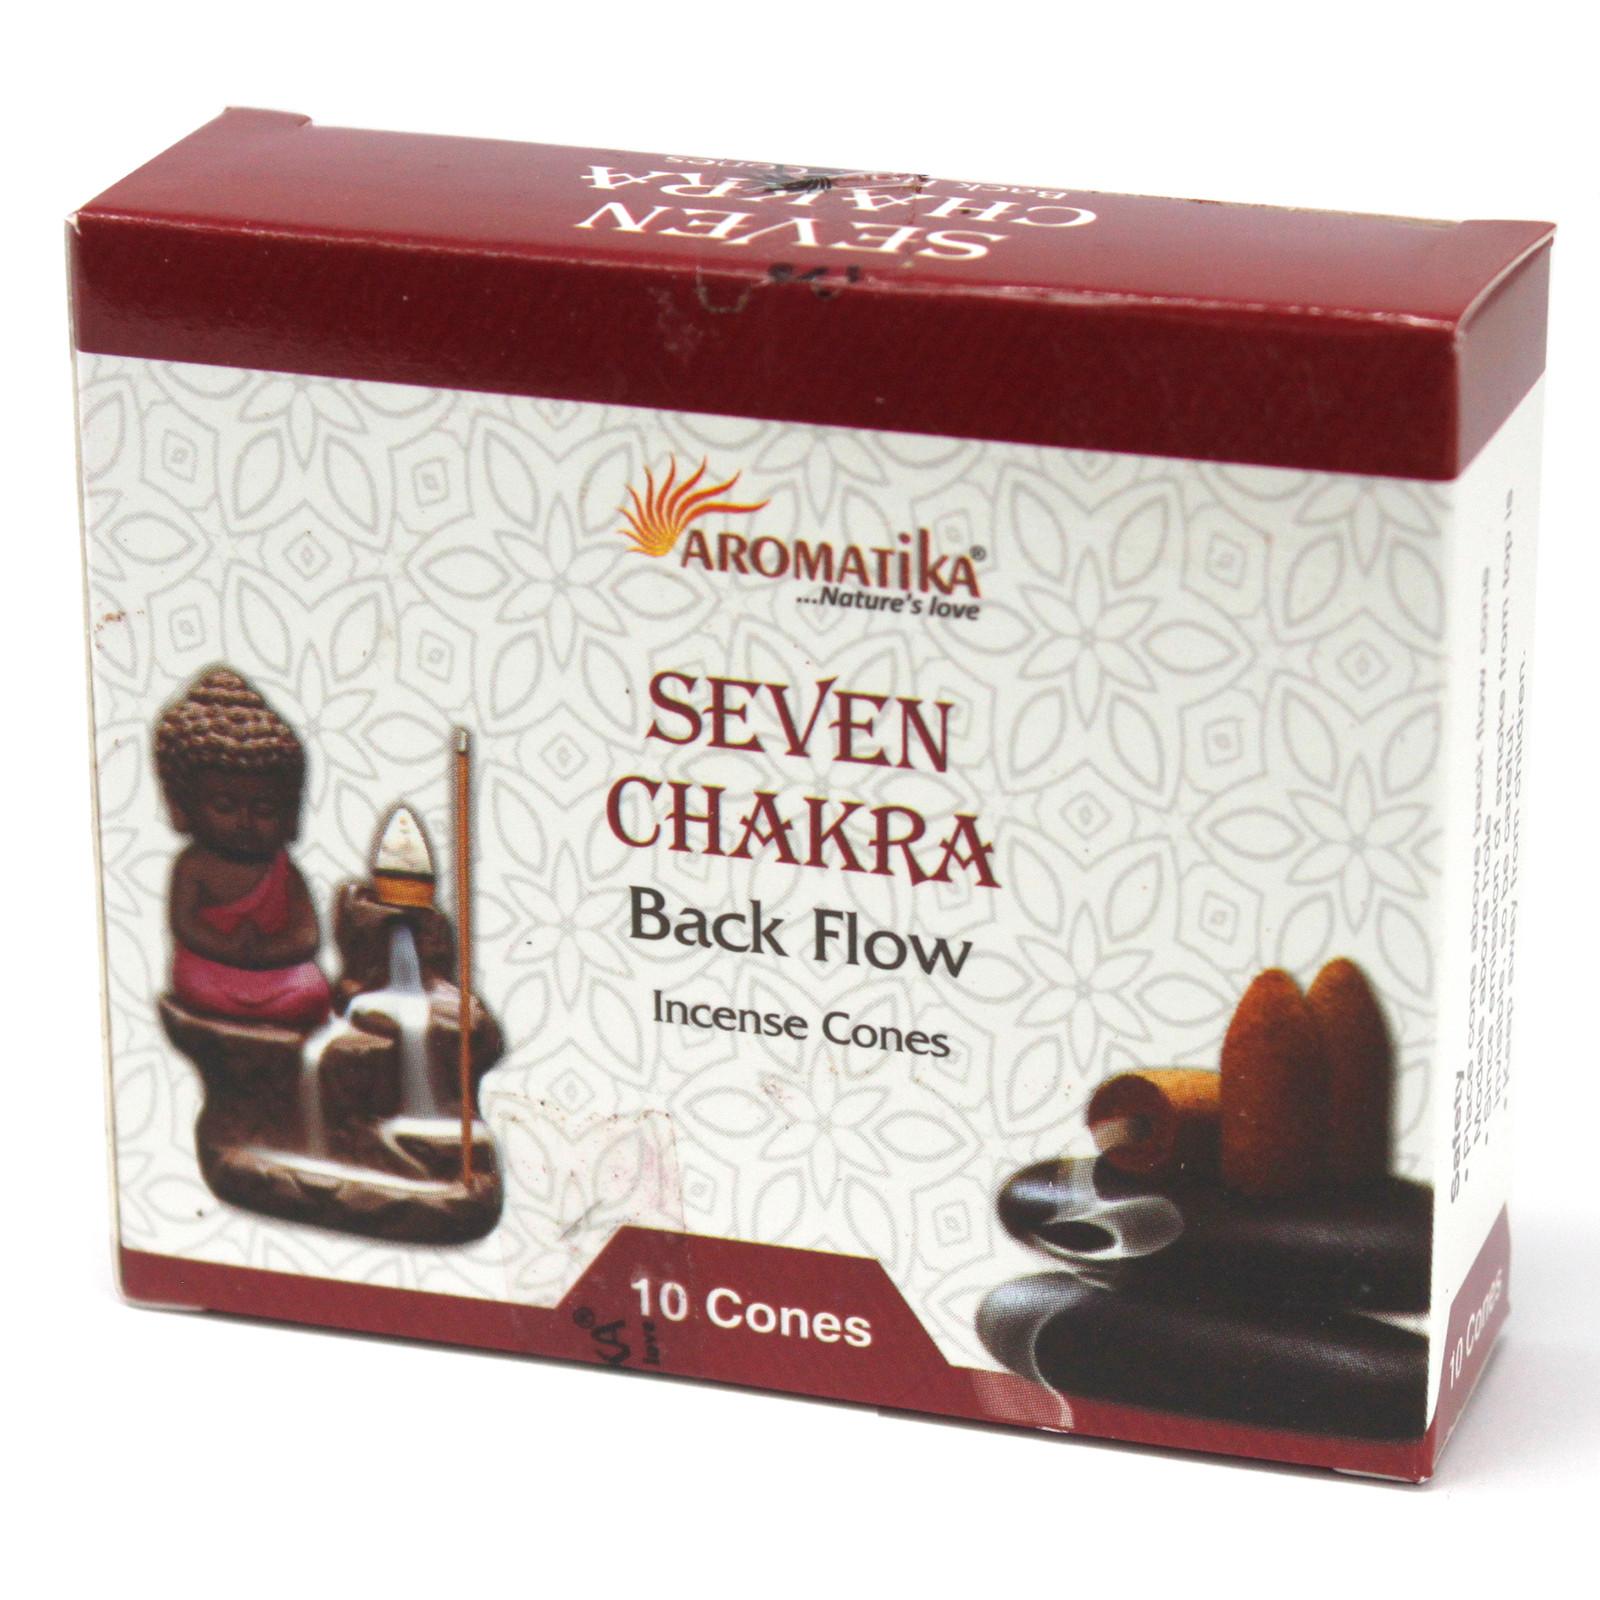 Aromatica Backflow Incense Cones 7 Charkras